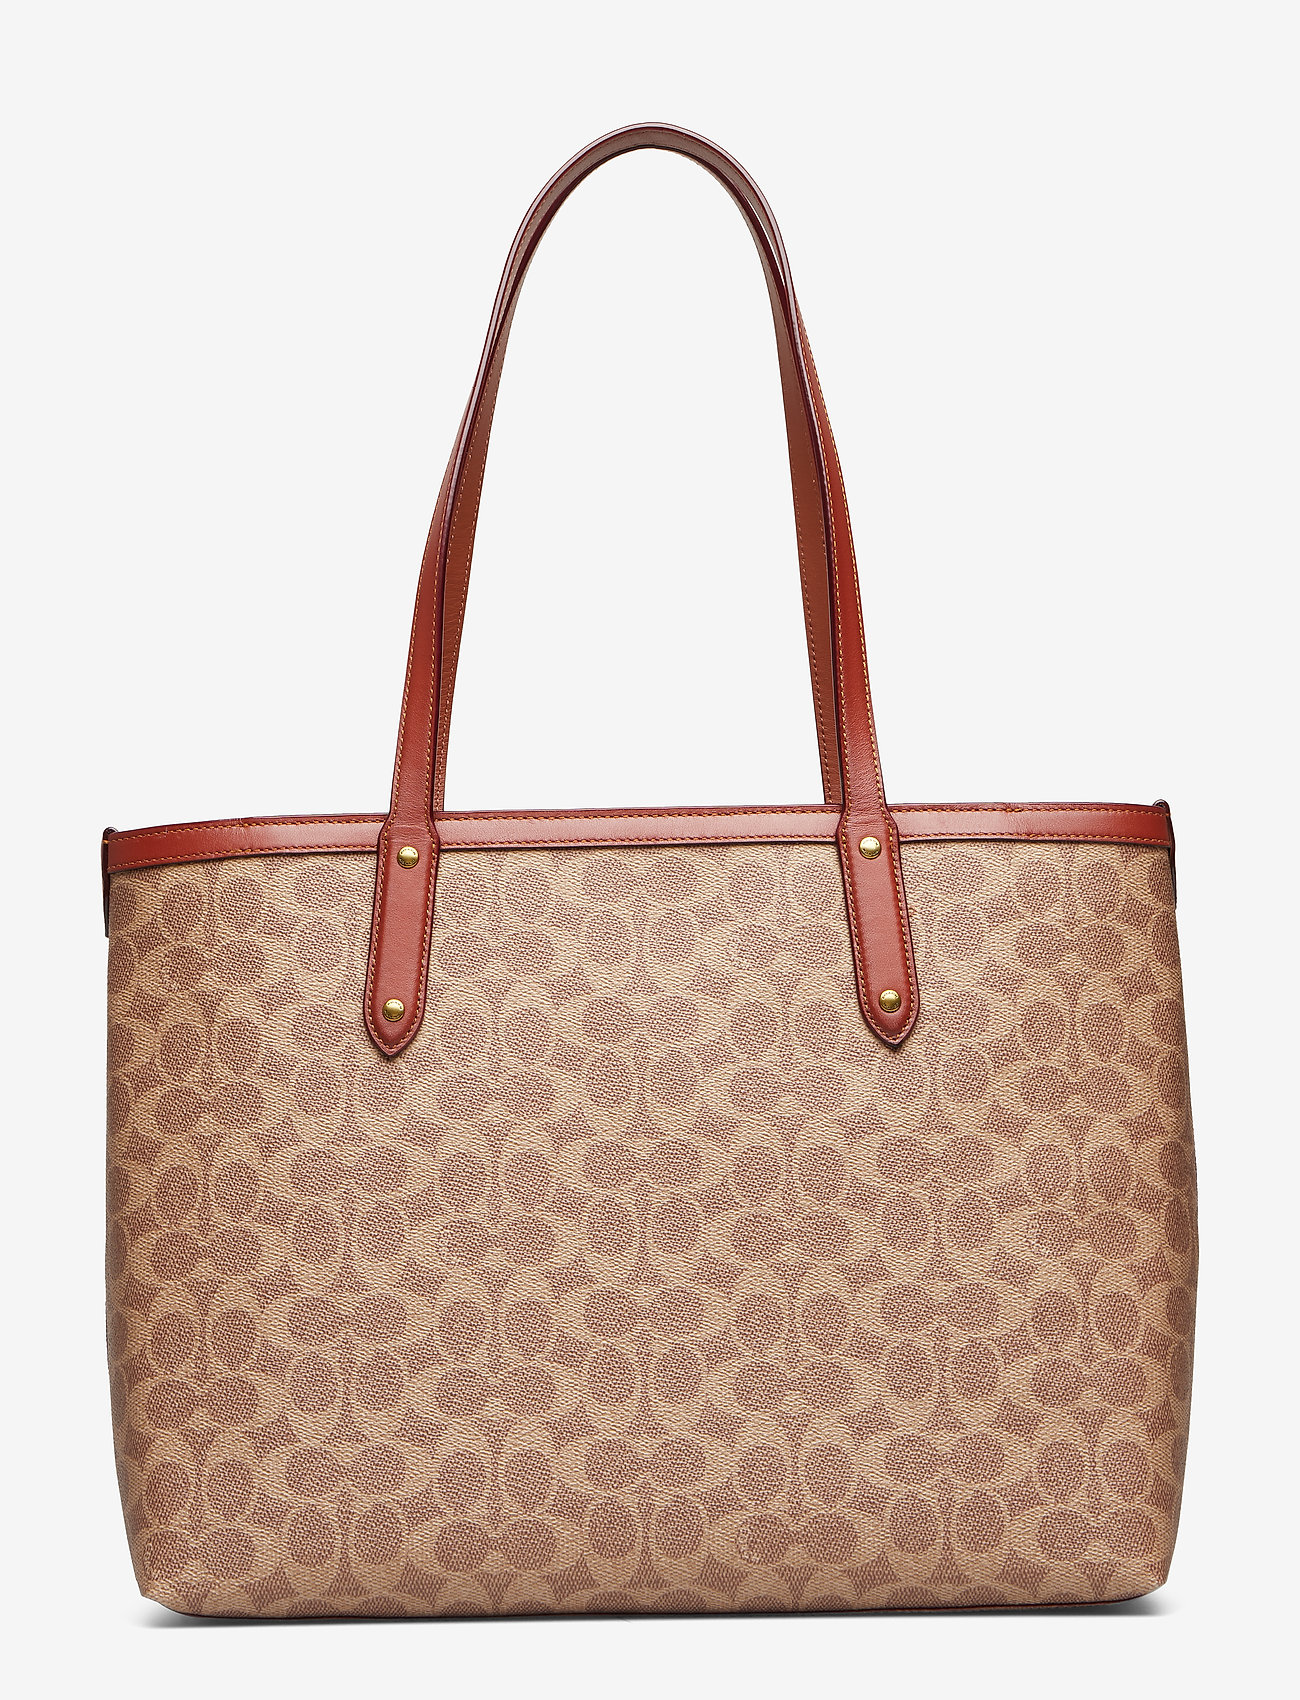 Coach - Womens Bags Totes - fashion shoppers - b4/tan rust